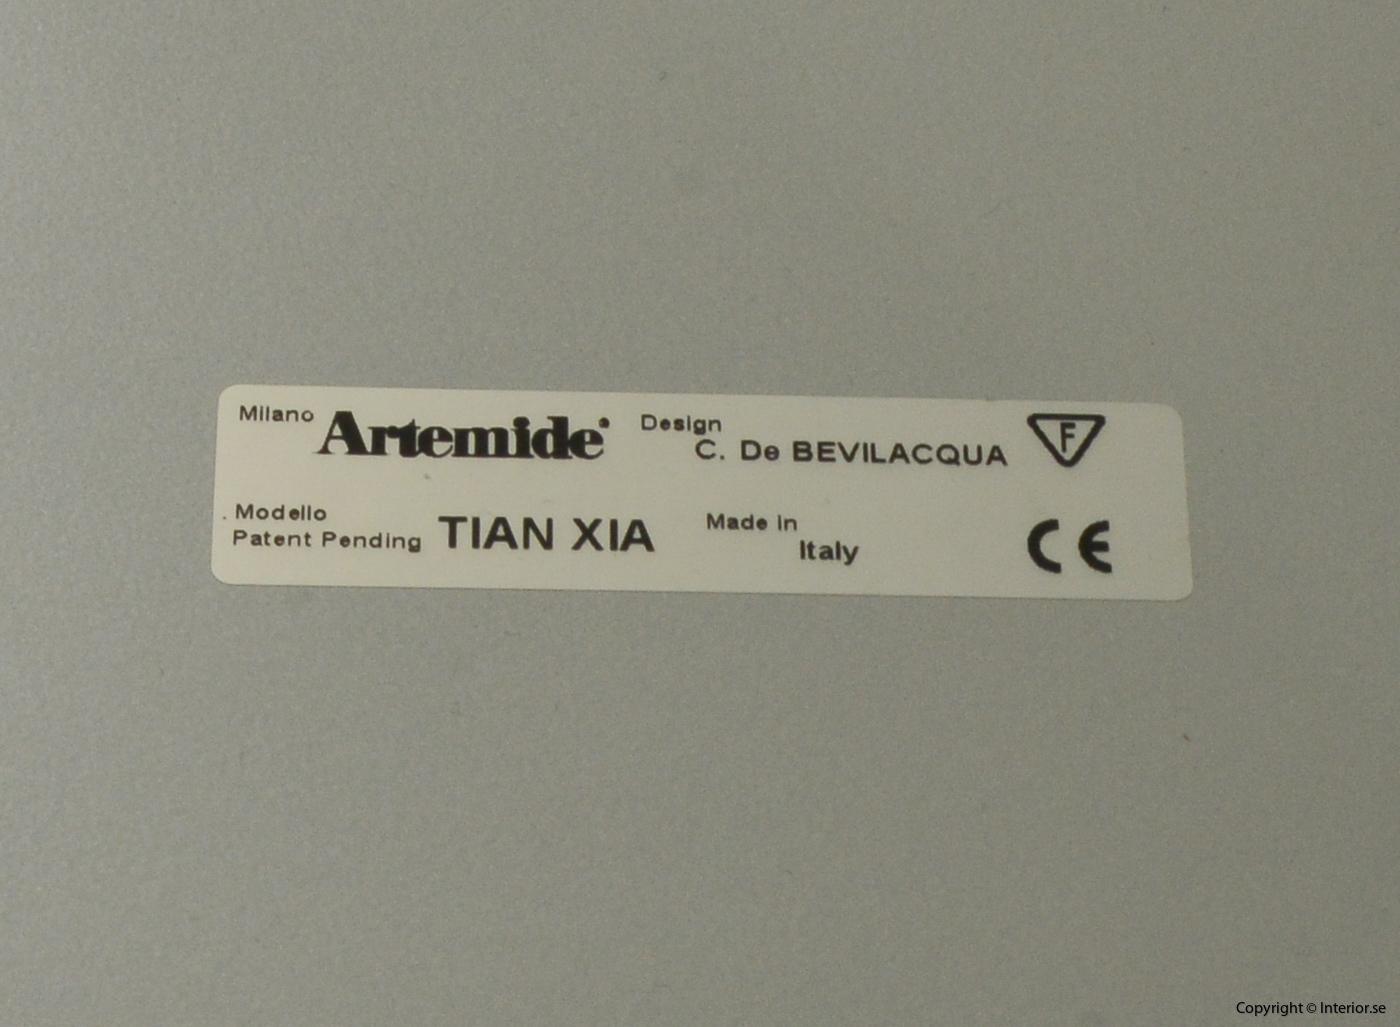 Pendel suspended lamp, Artemide Tian Xia 80 cm - Carlotta de Bevilacqua 6